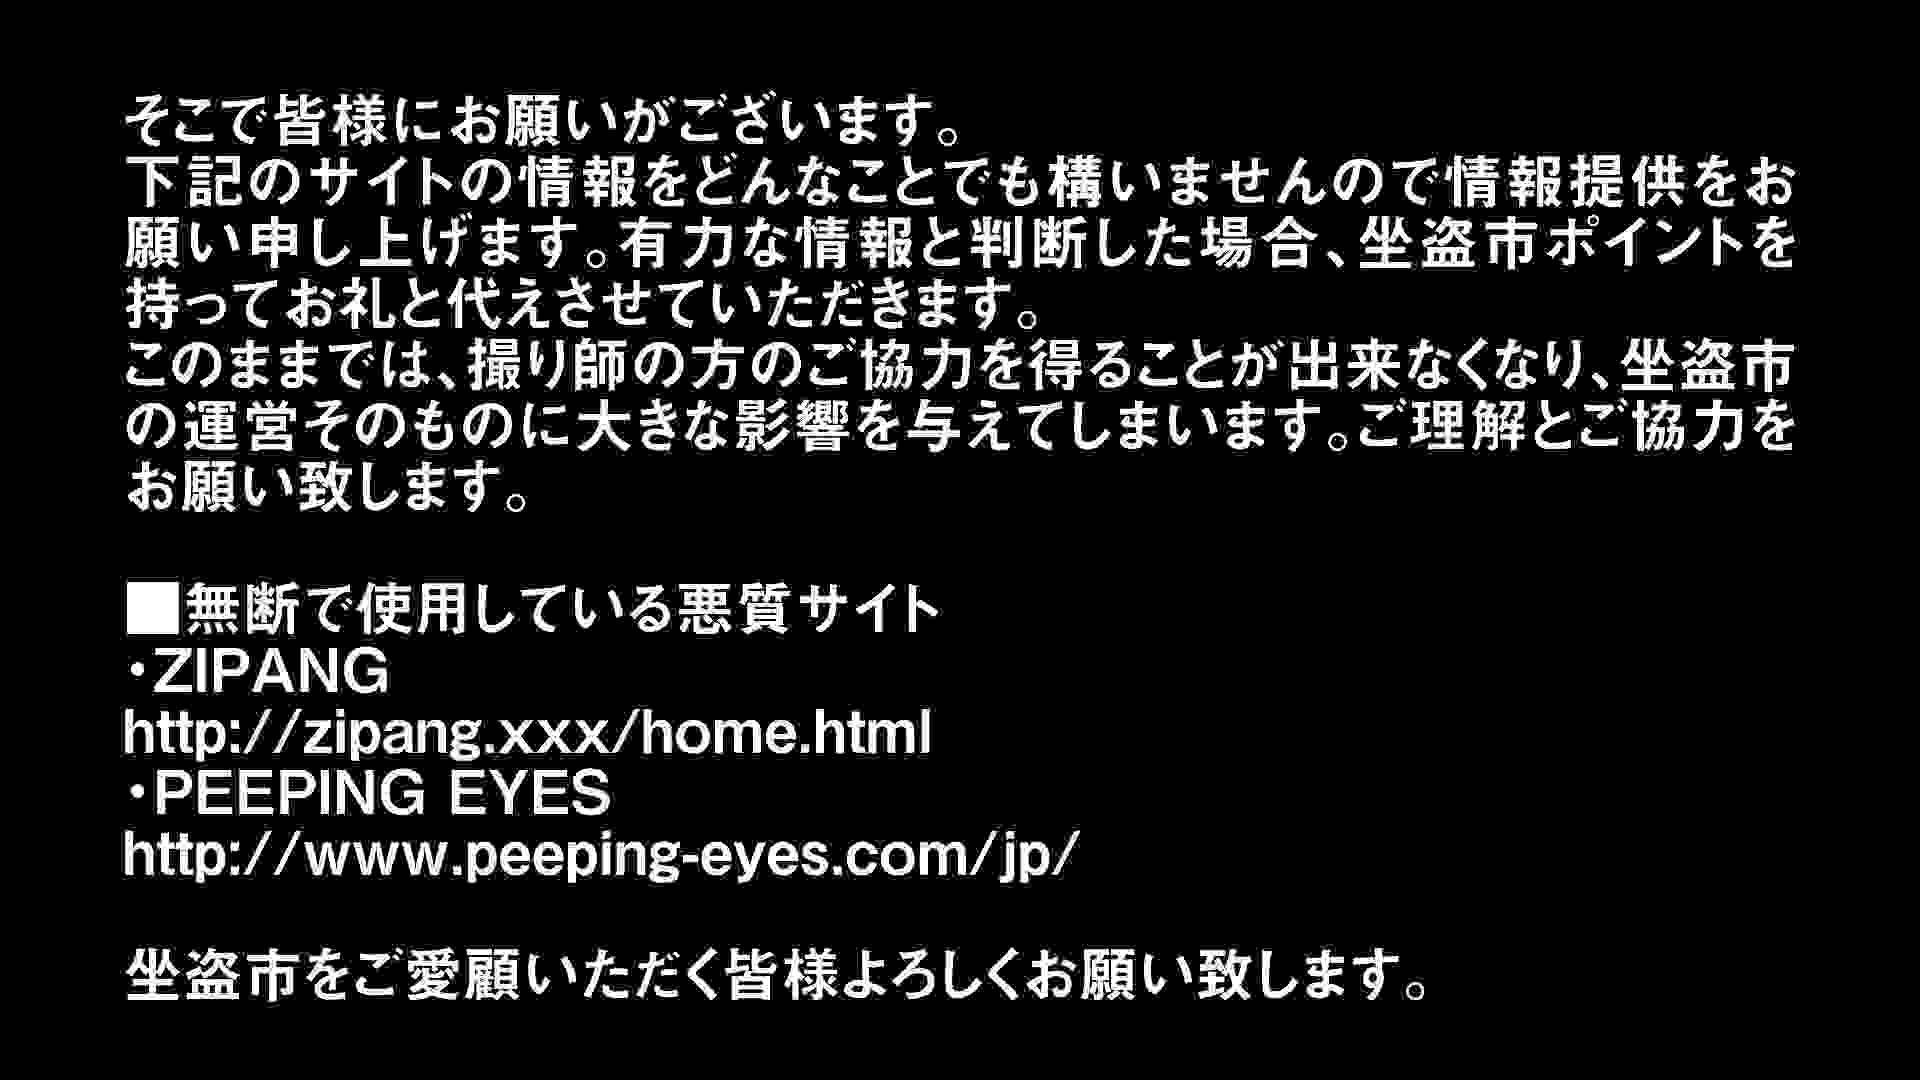 Aquaな露天風呂Vol.303 露天風呂 AV無料 70連発 2